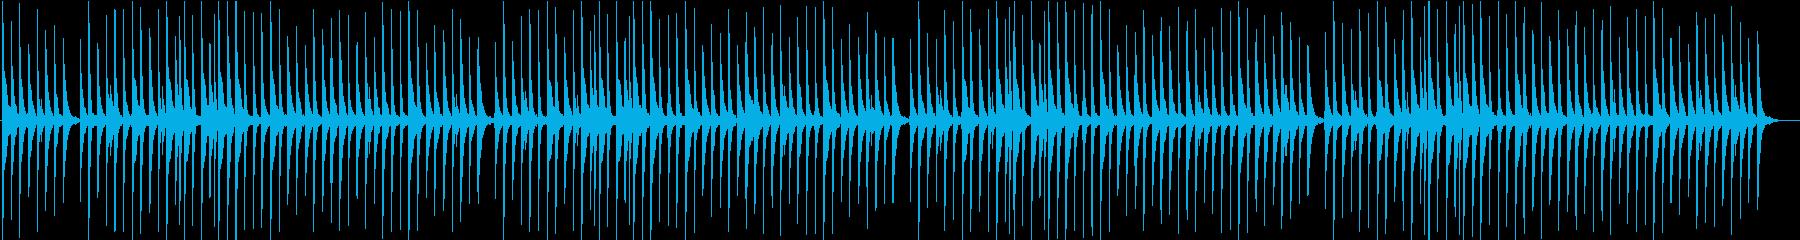 "Okinawa folk song ""Iwaibushi (slow play)"" Sanshin only's reproduced waveform"